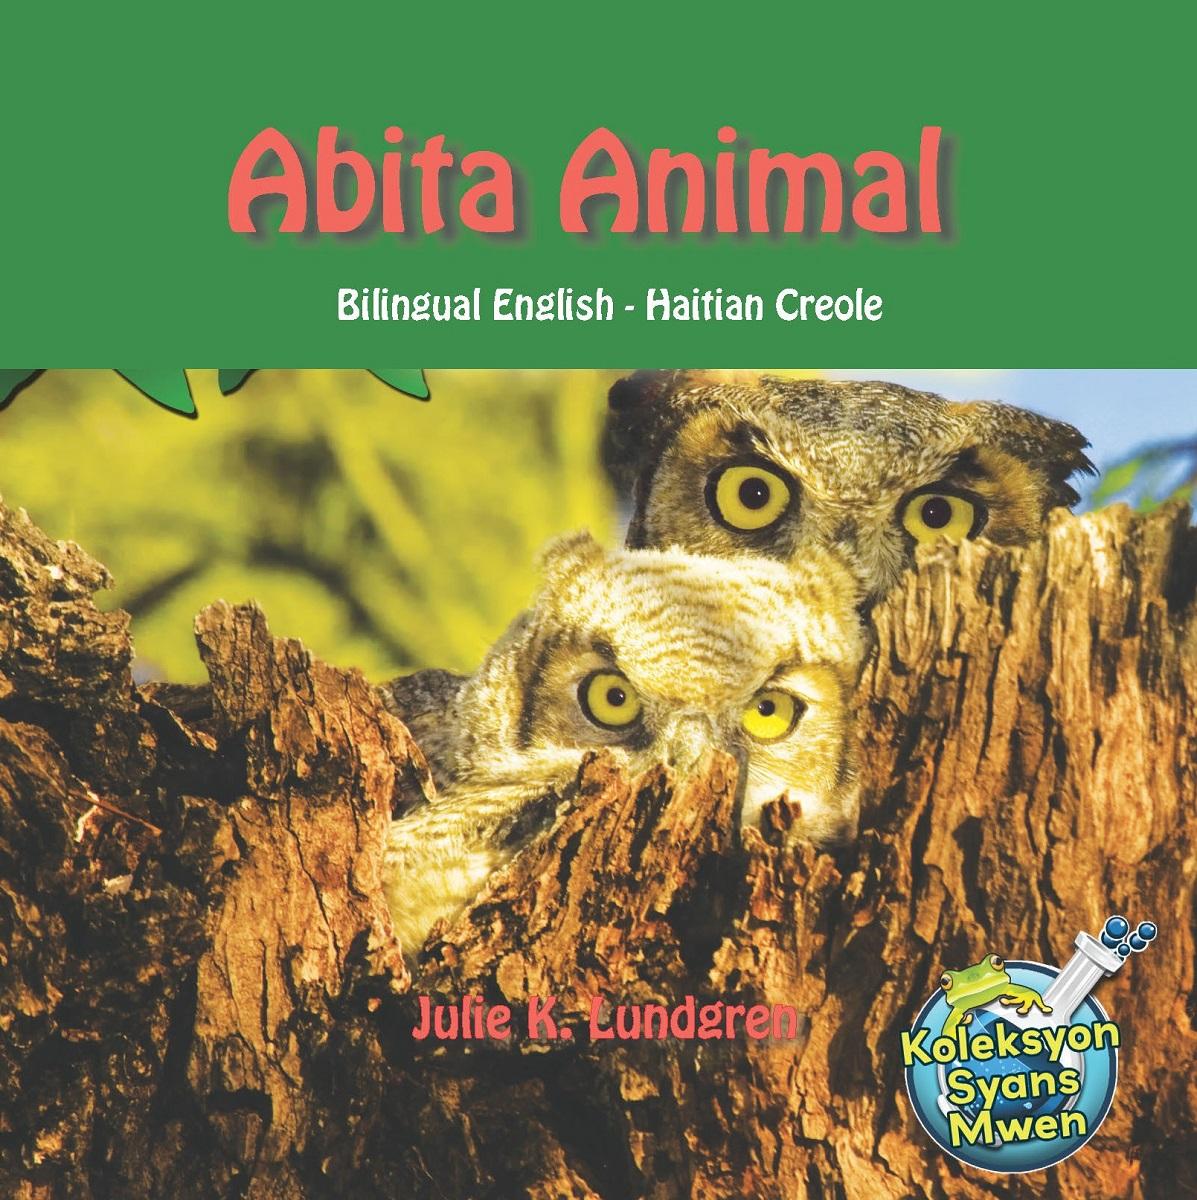 Abita Animal